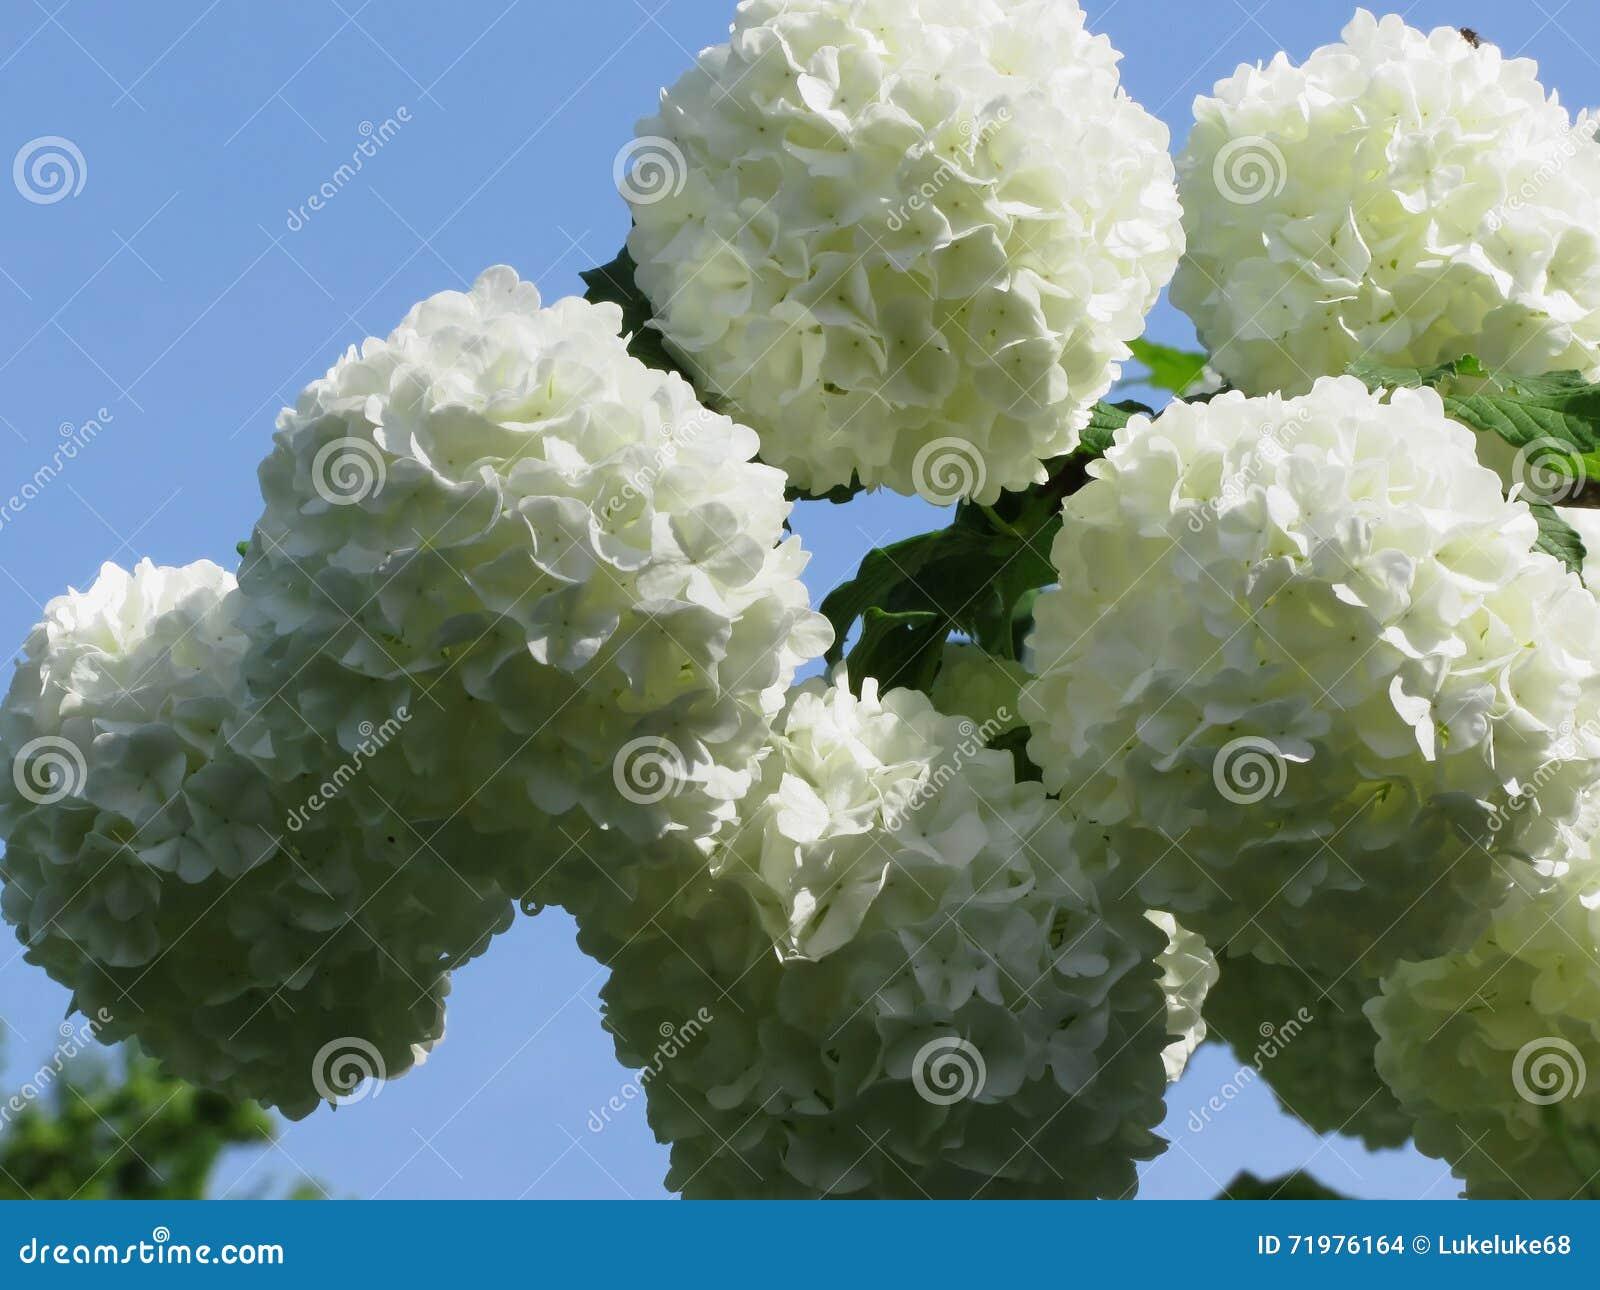 balls of white hydrangea flowers stock photo  image, Natural flower